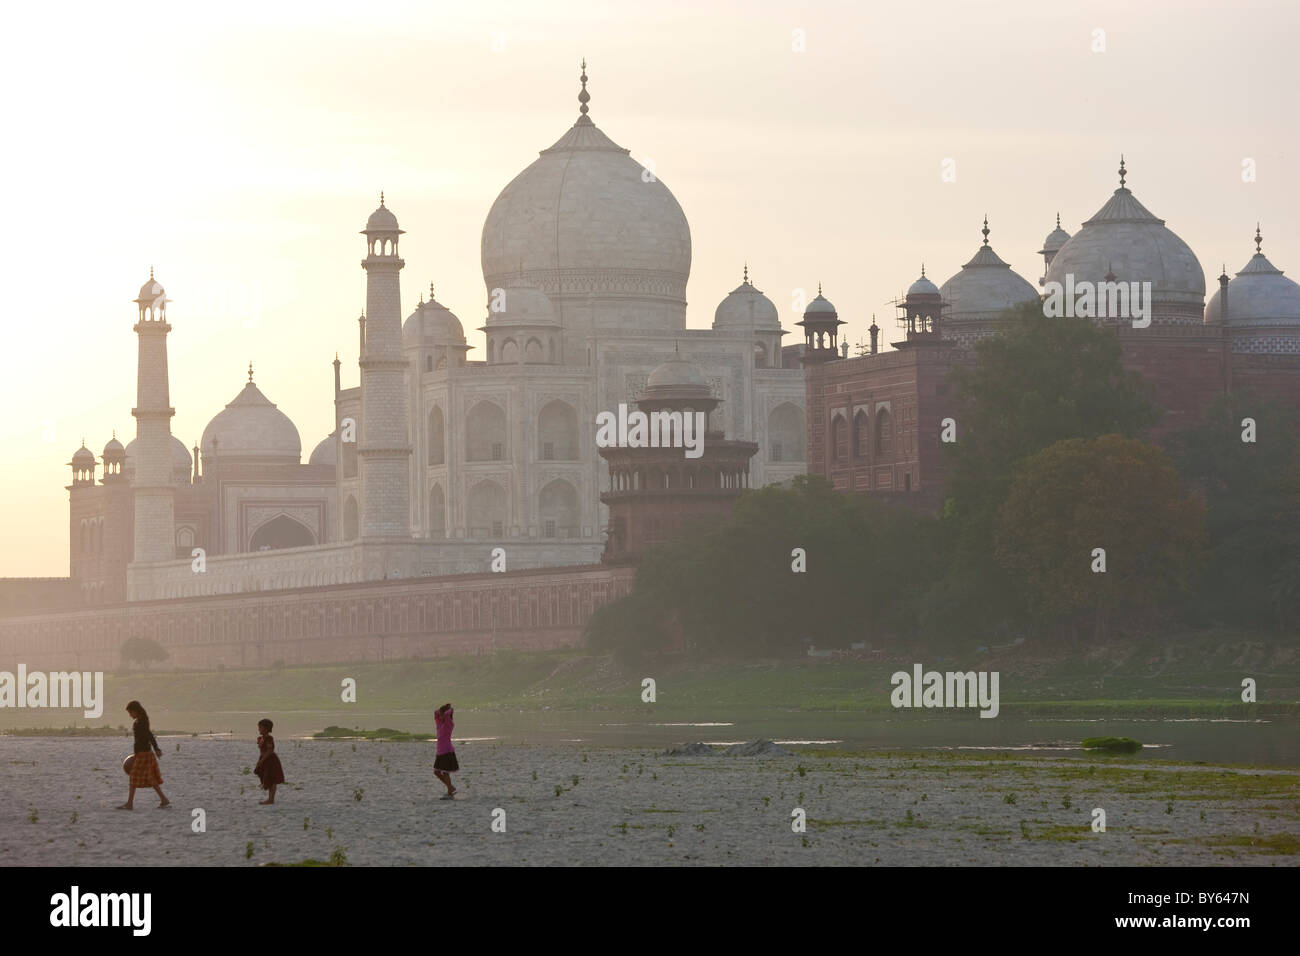 Taj Mahal on the banks of the River Yamuna, Agra, India - Stock Image